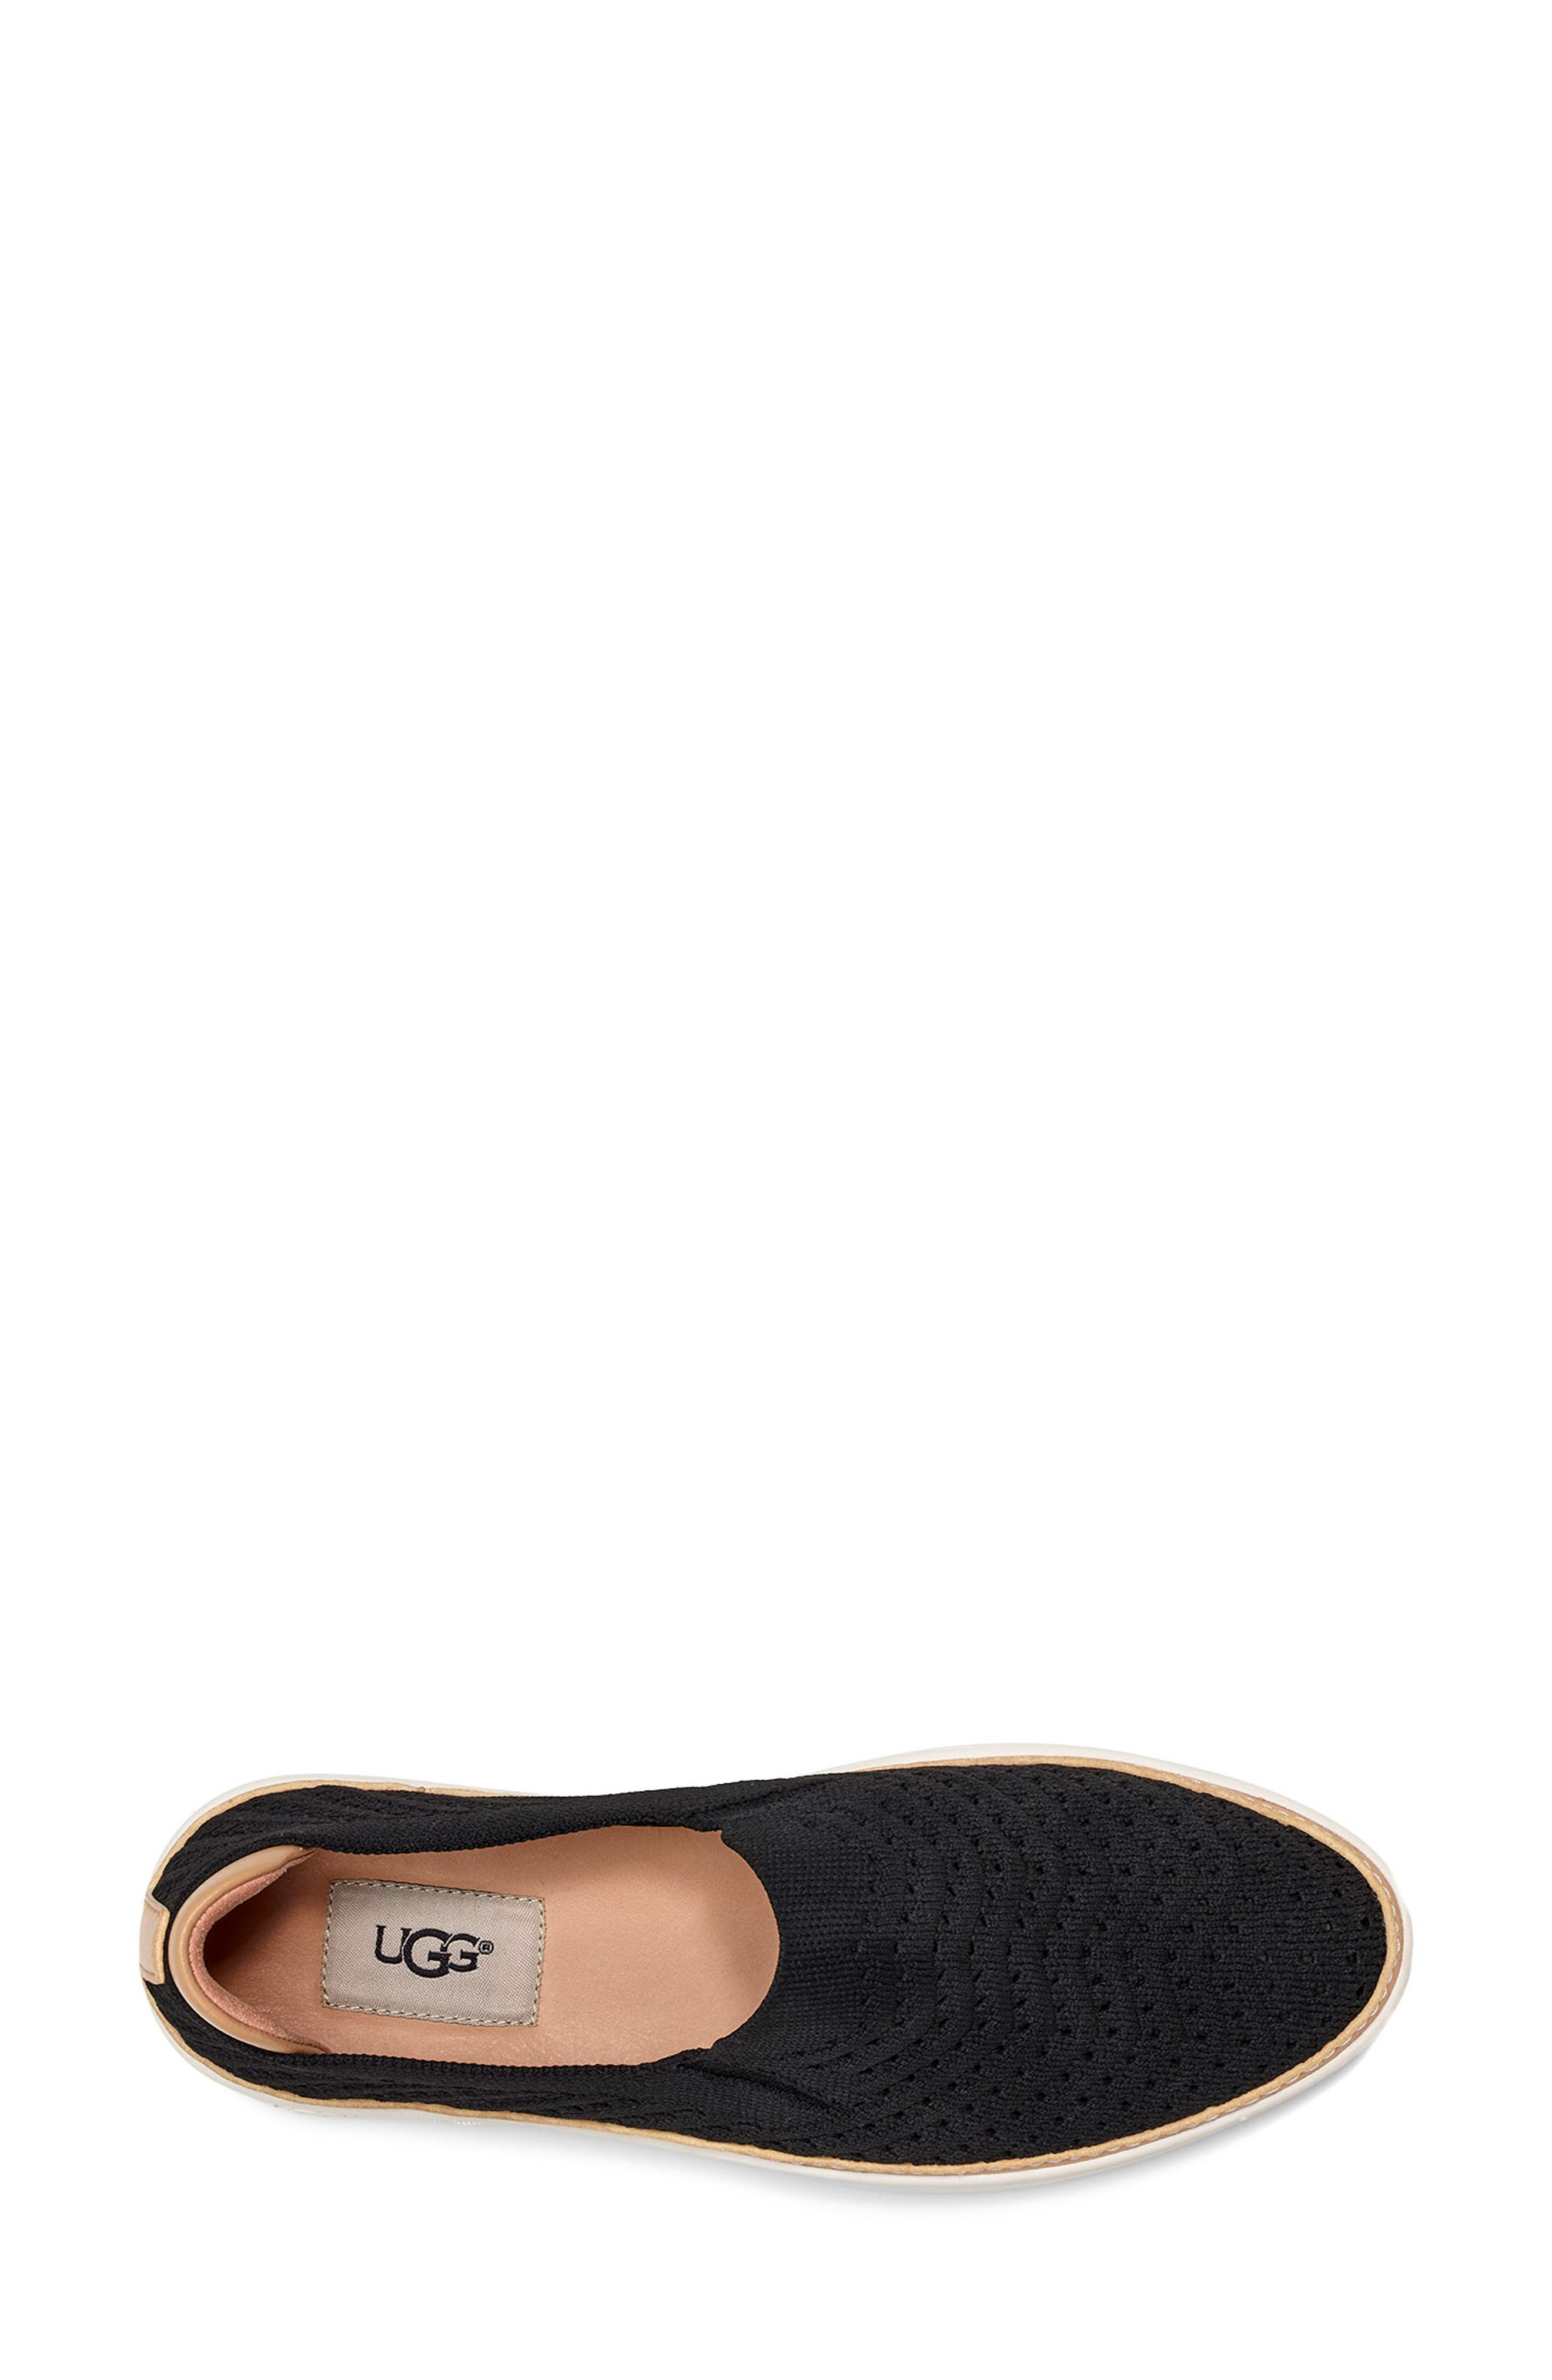 UGG<SUP>®</SUP>, Sammy Slip-On Sneaker, Alternate thumbnail 4, color, BLACK FABRIC